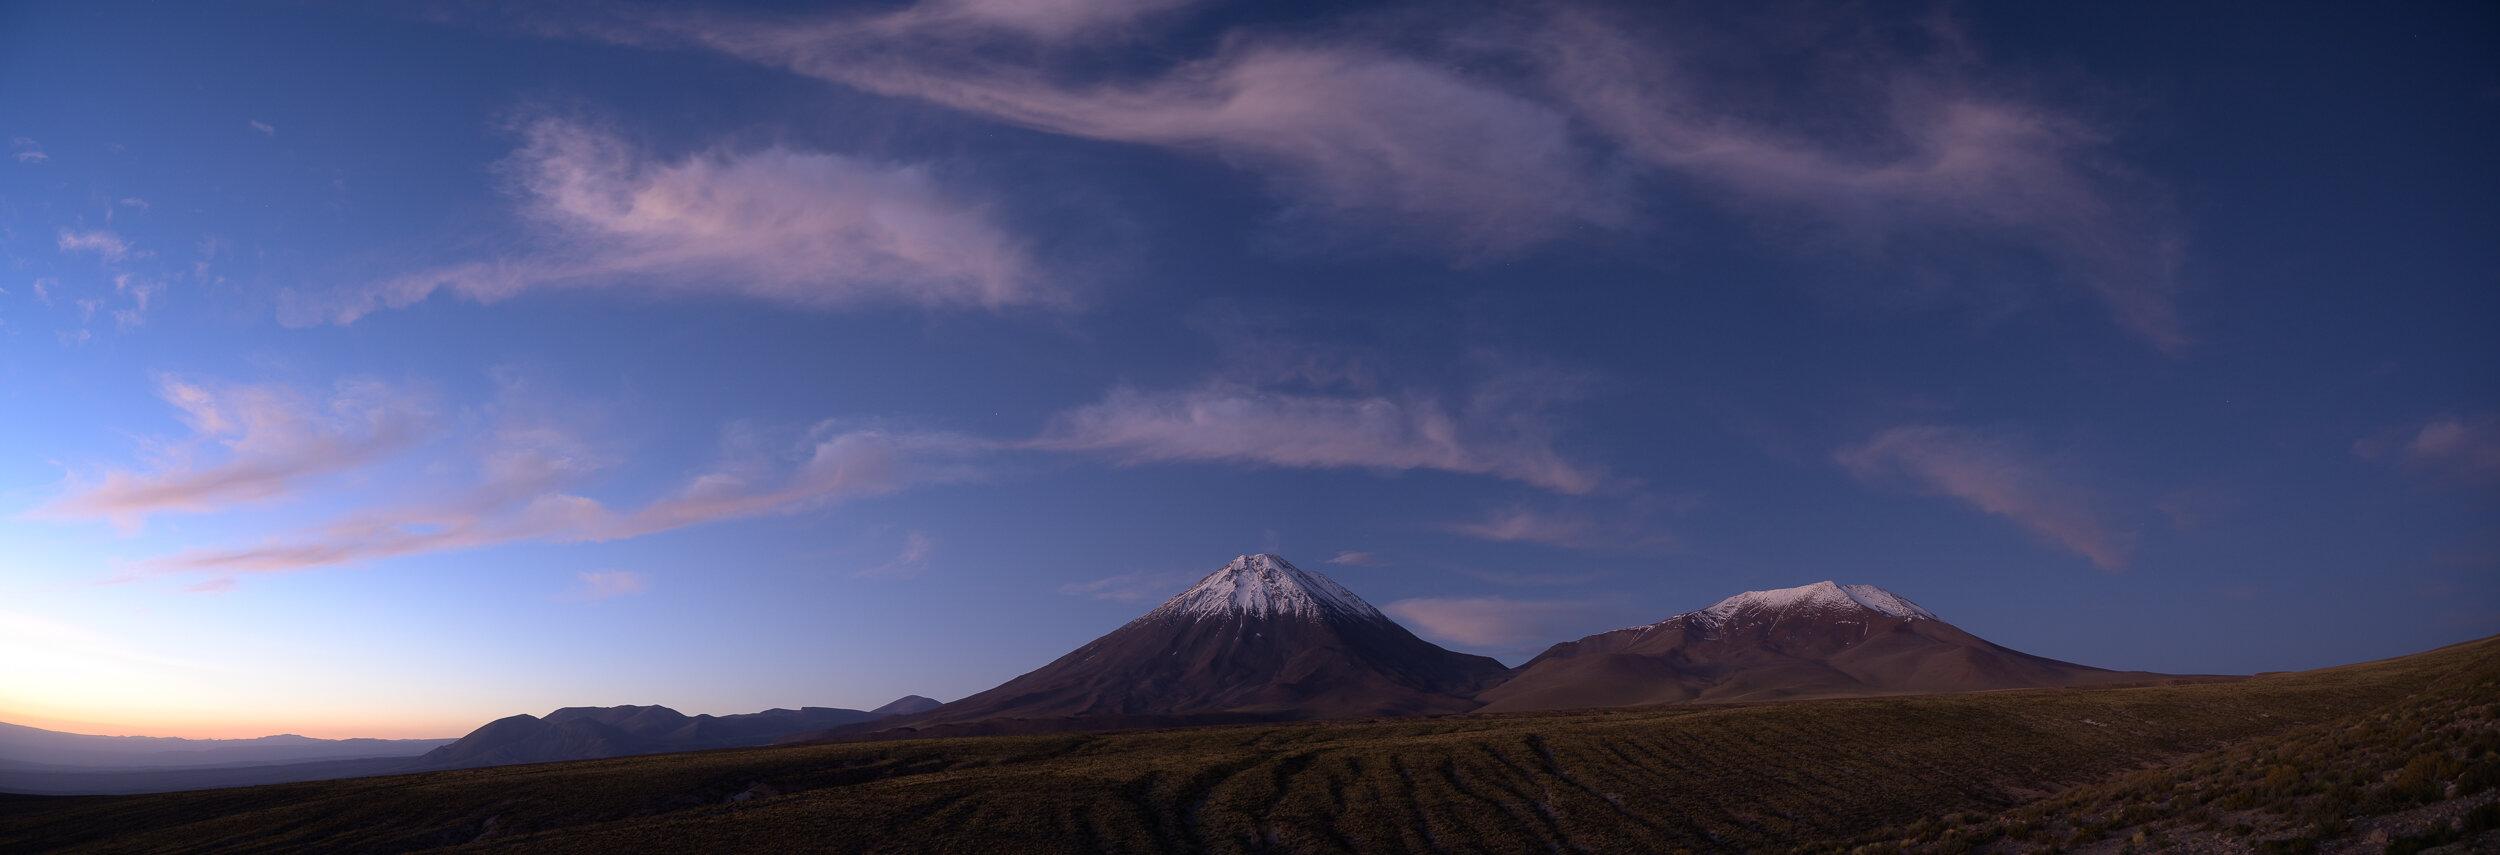 Atacama-5697-Pano.jpg